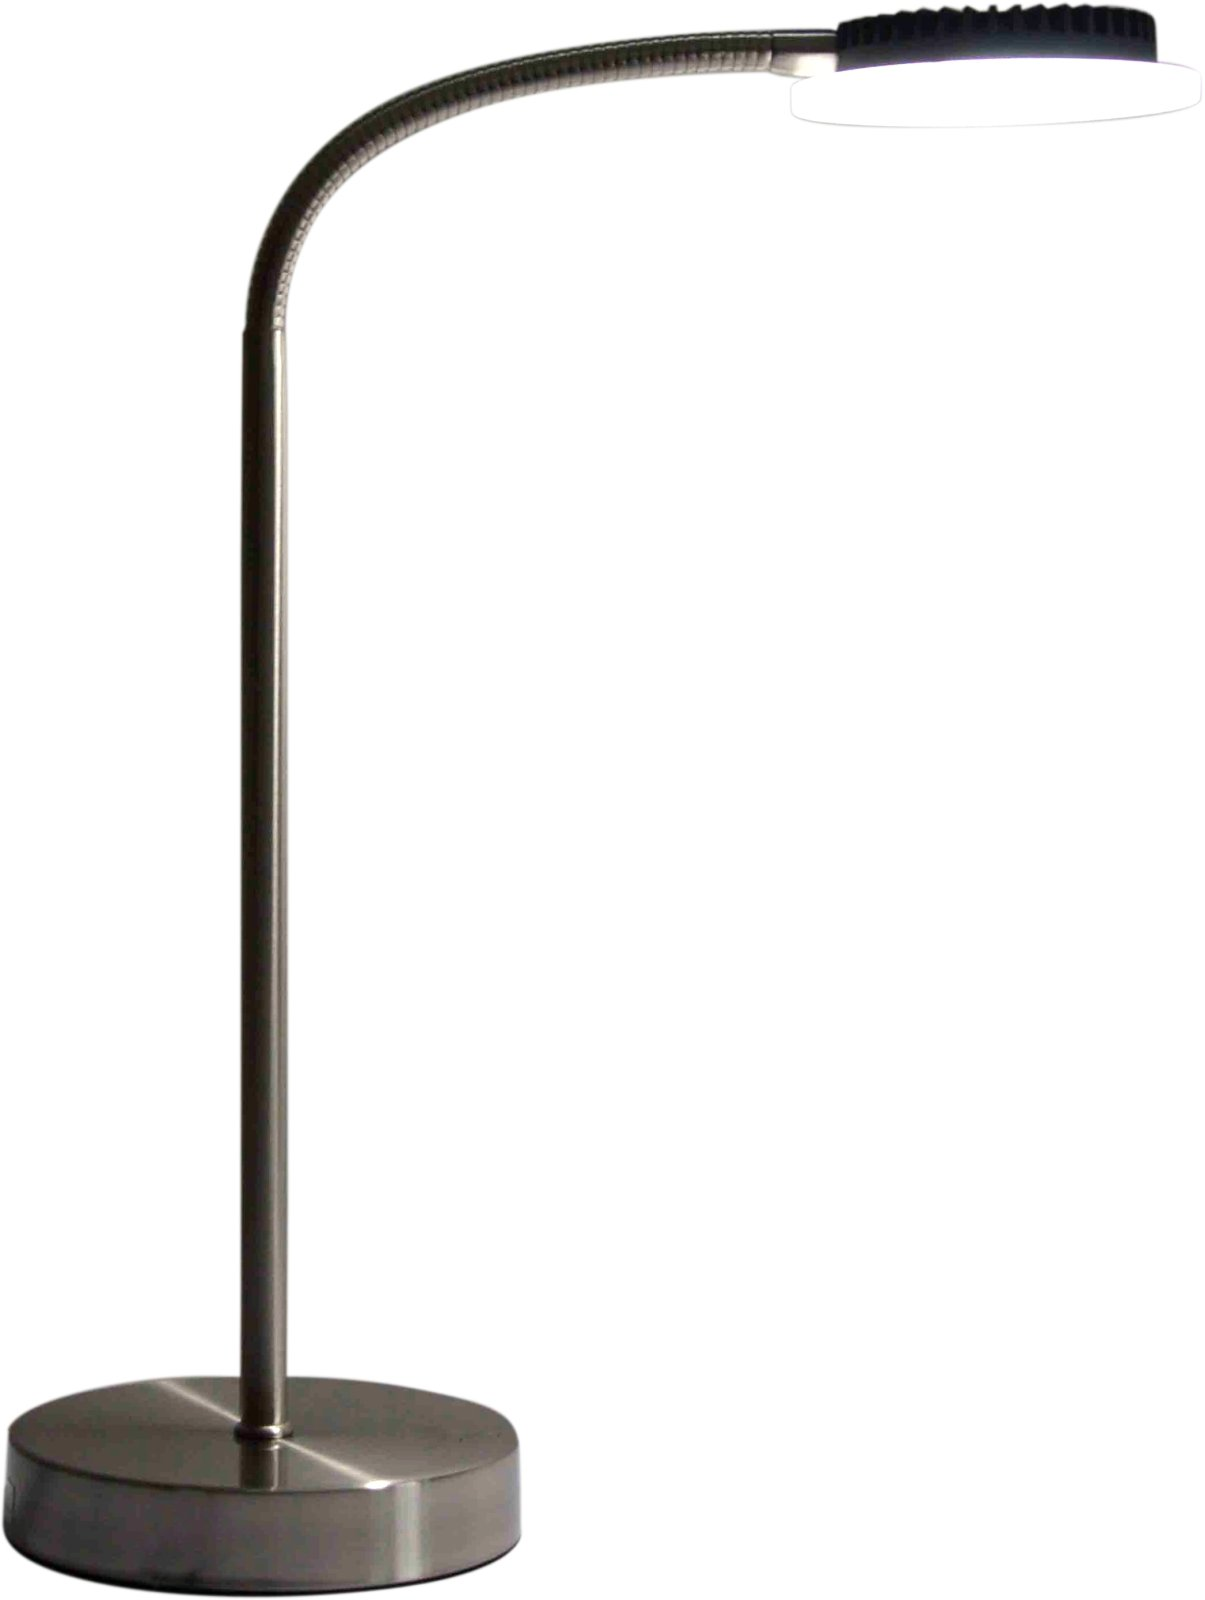 PureOptics LED Desk Lamp with 2 USB Ports, 6600K Color Temperature, Adjustable Gooseneck (VLED625D)